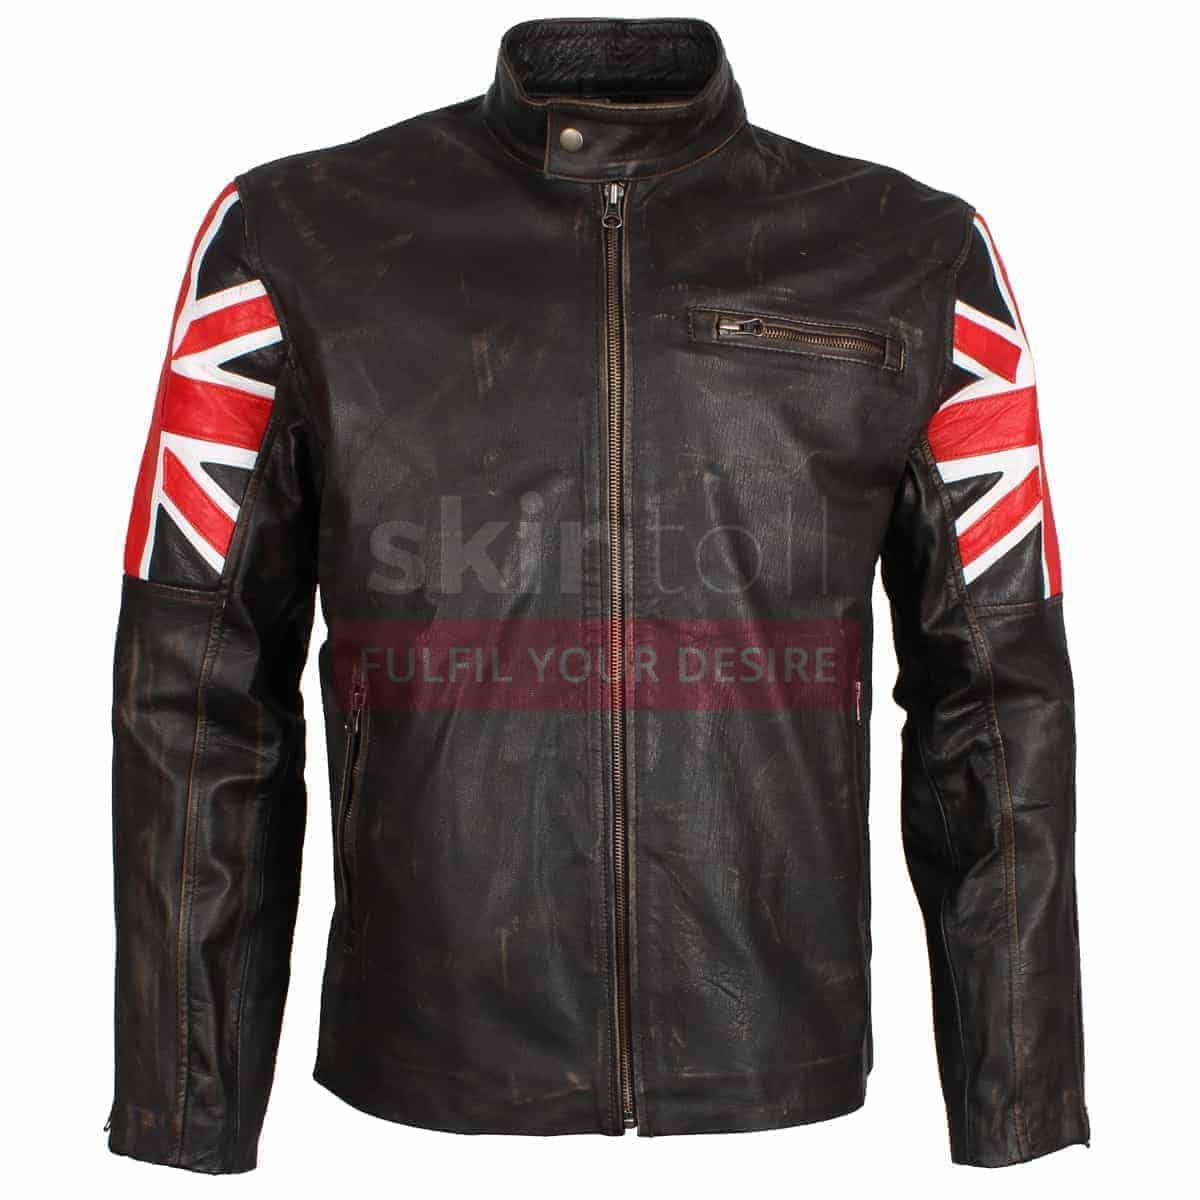 Motorcycle leather jacket sale